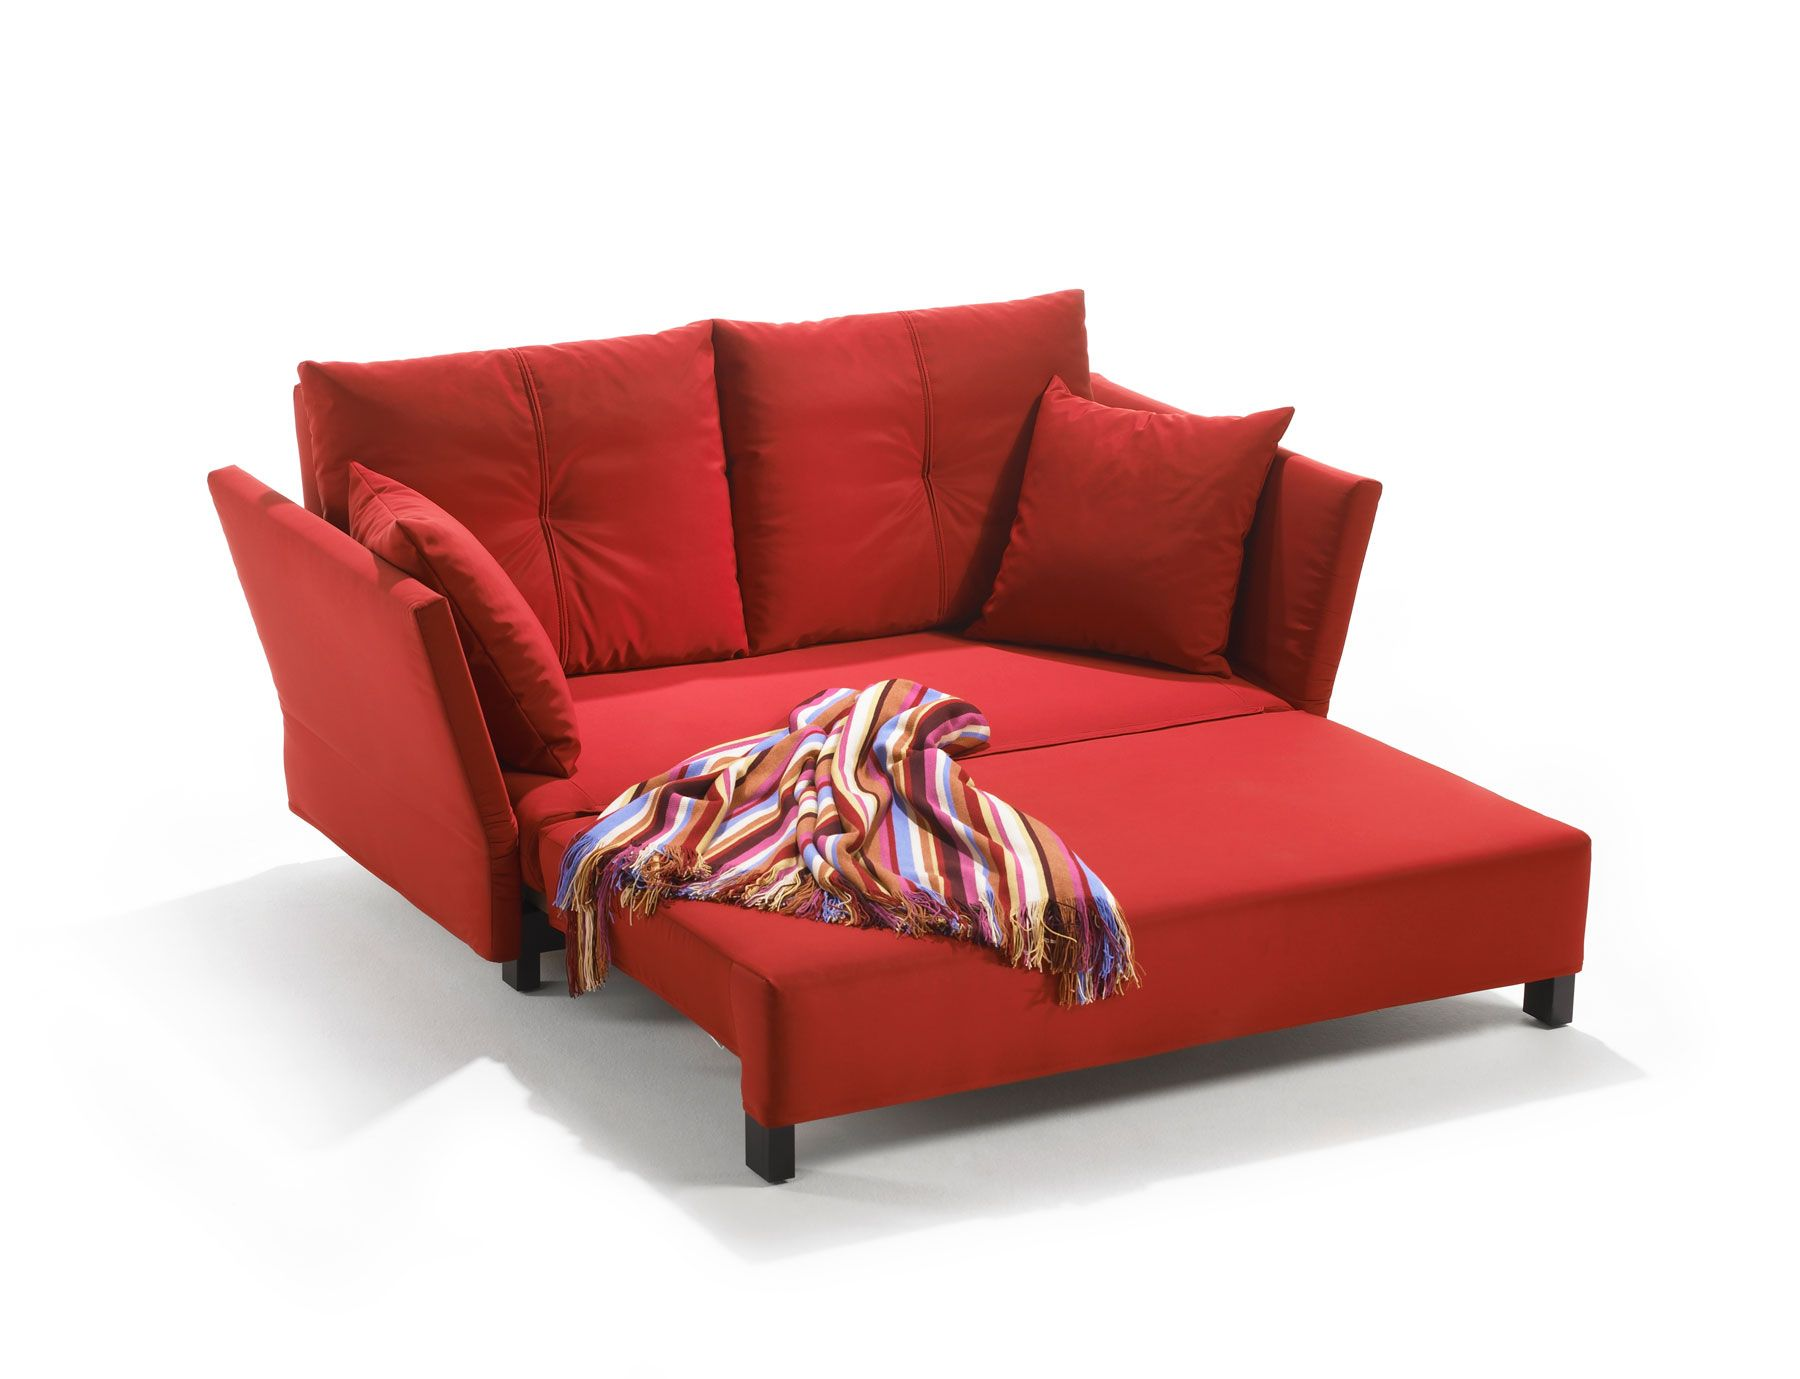 signet bewegende formen schlafsofas elementgruppen mit schlaffunktion home schlafsofa. Black Bedroom Furniture Sets. Home Design Ideas